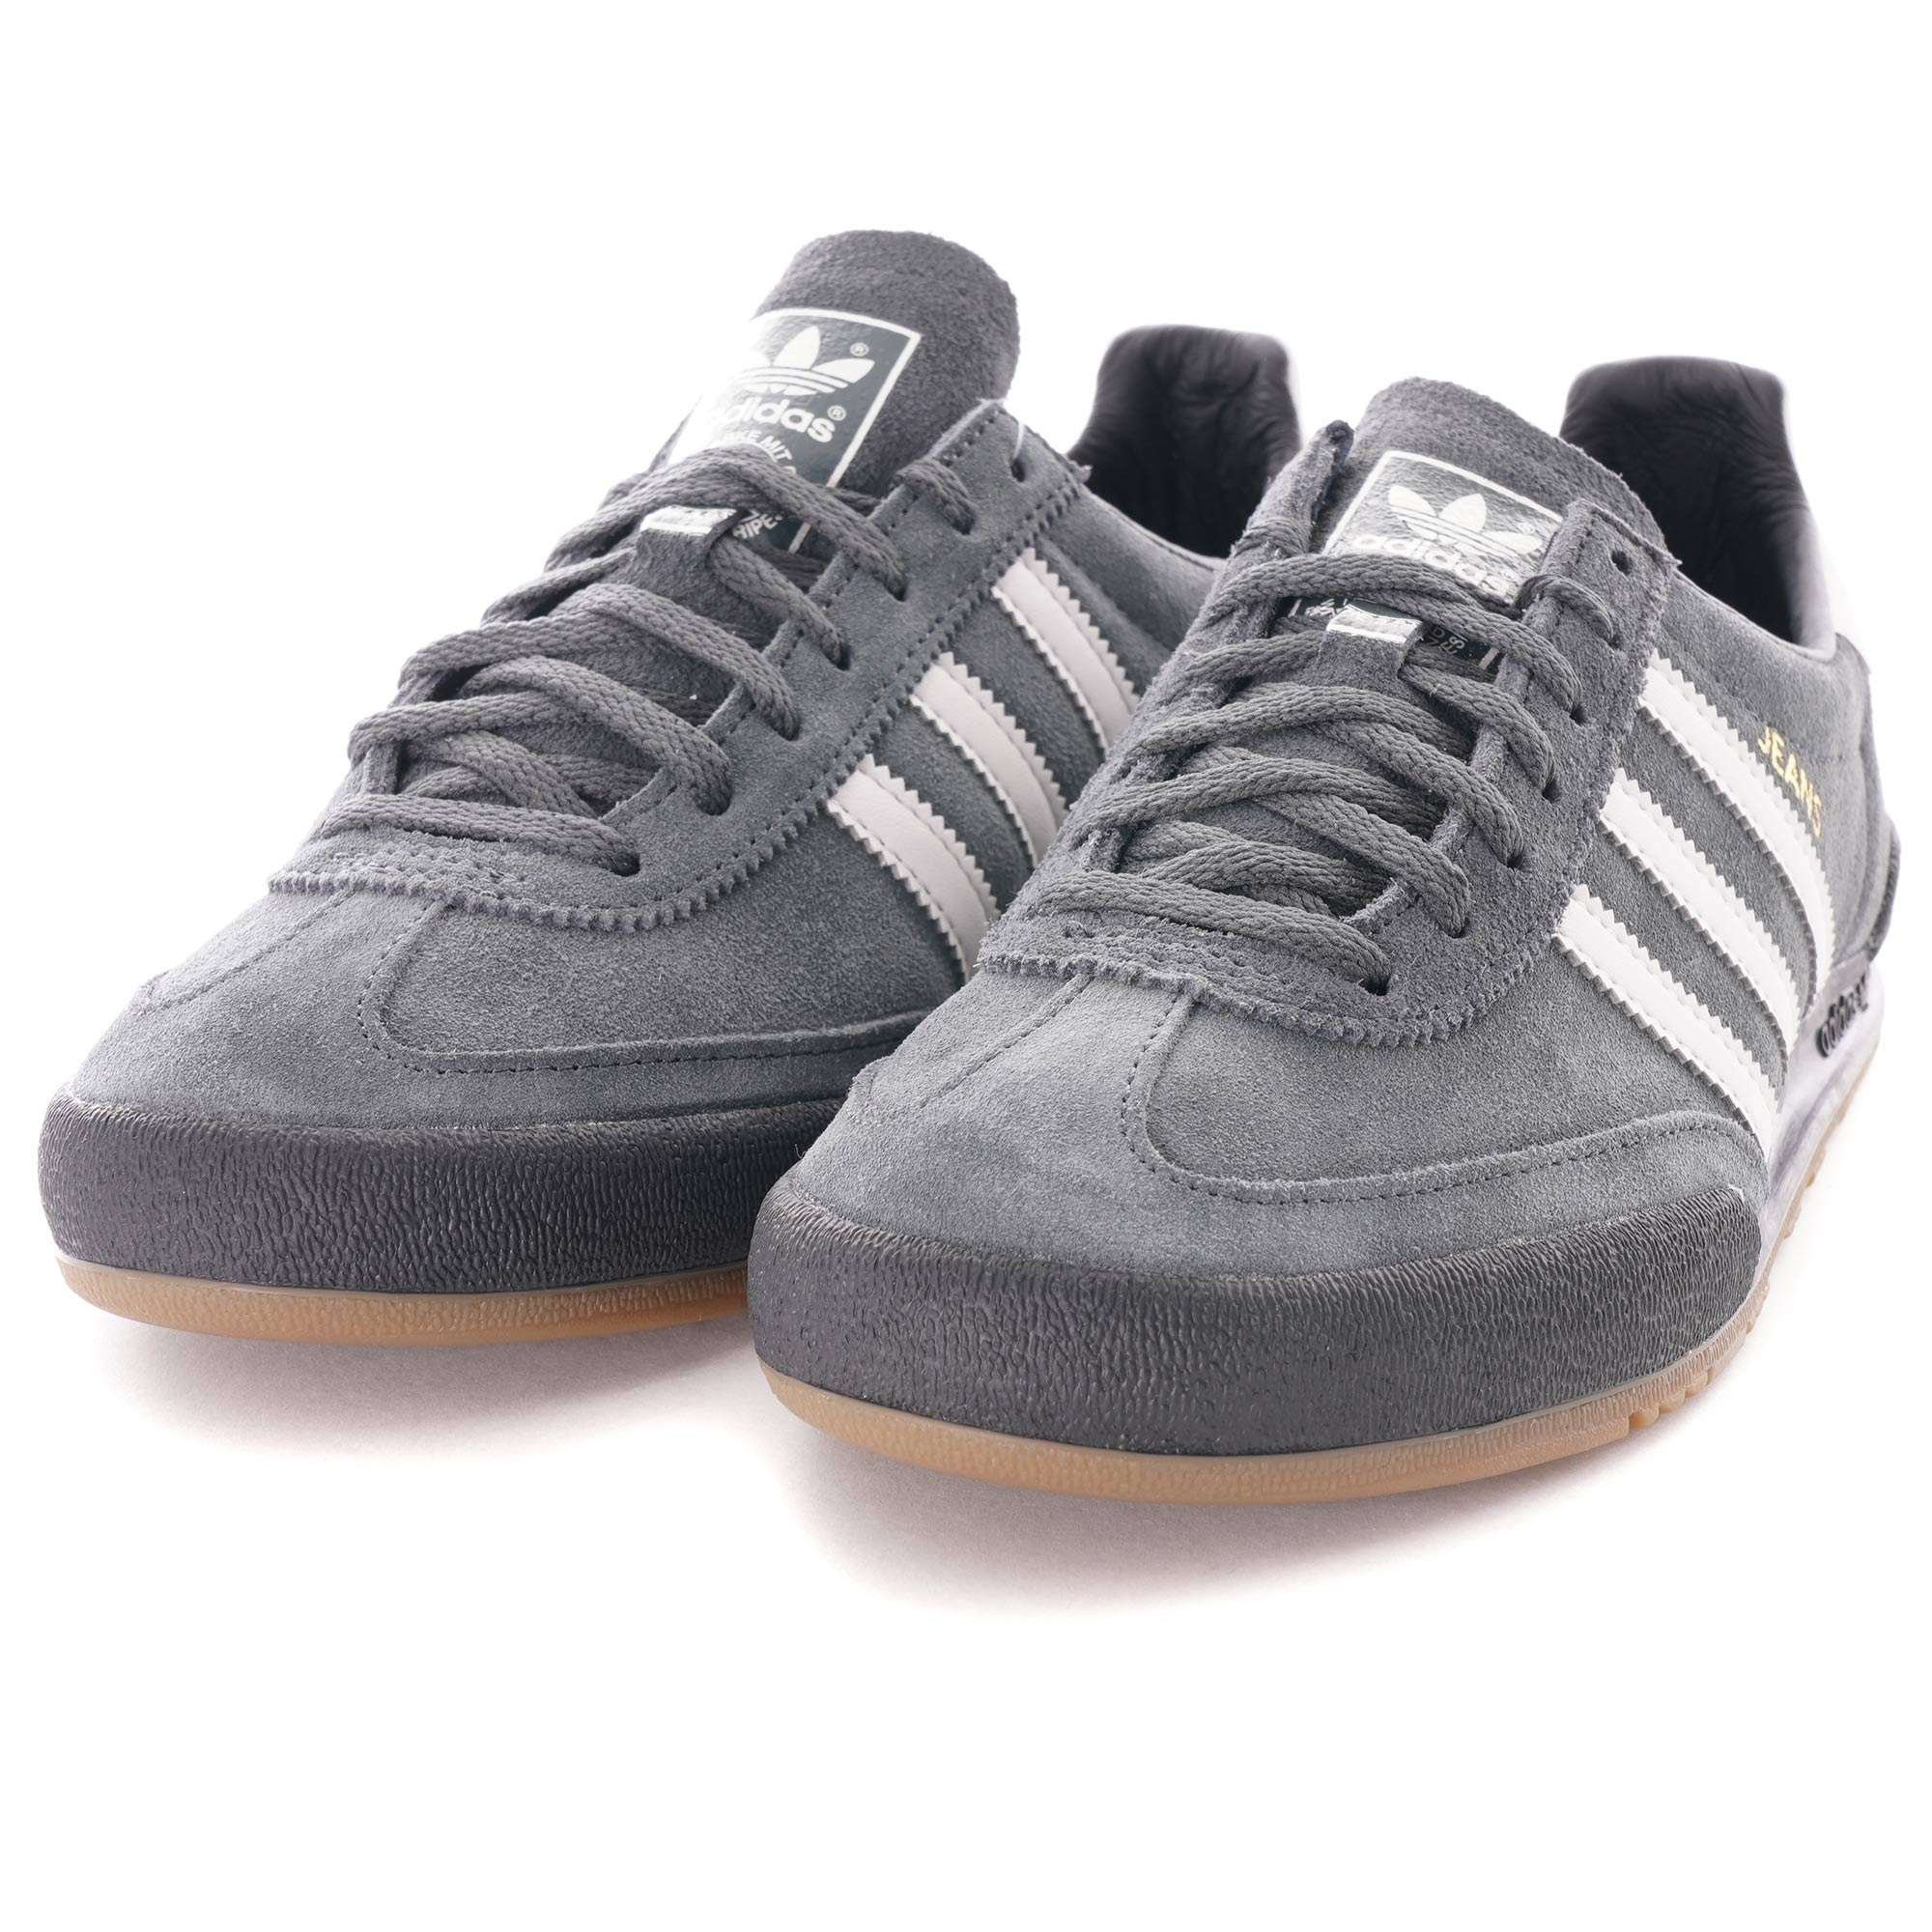 adidas Originals Jeans   Grey   CQ2768